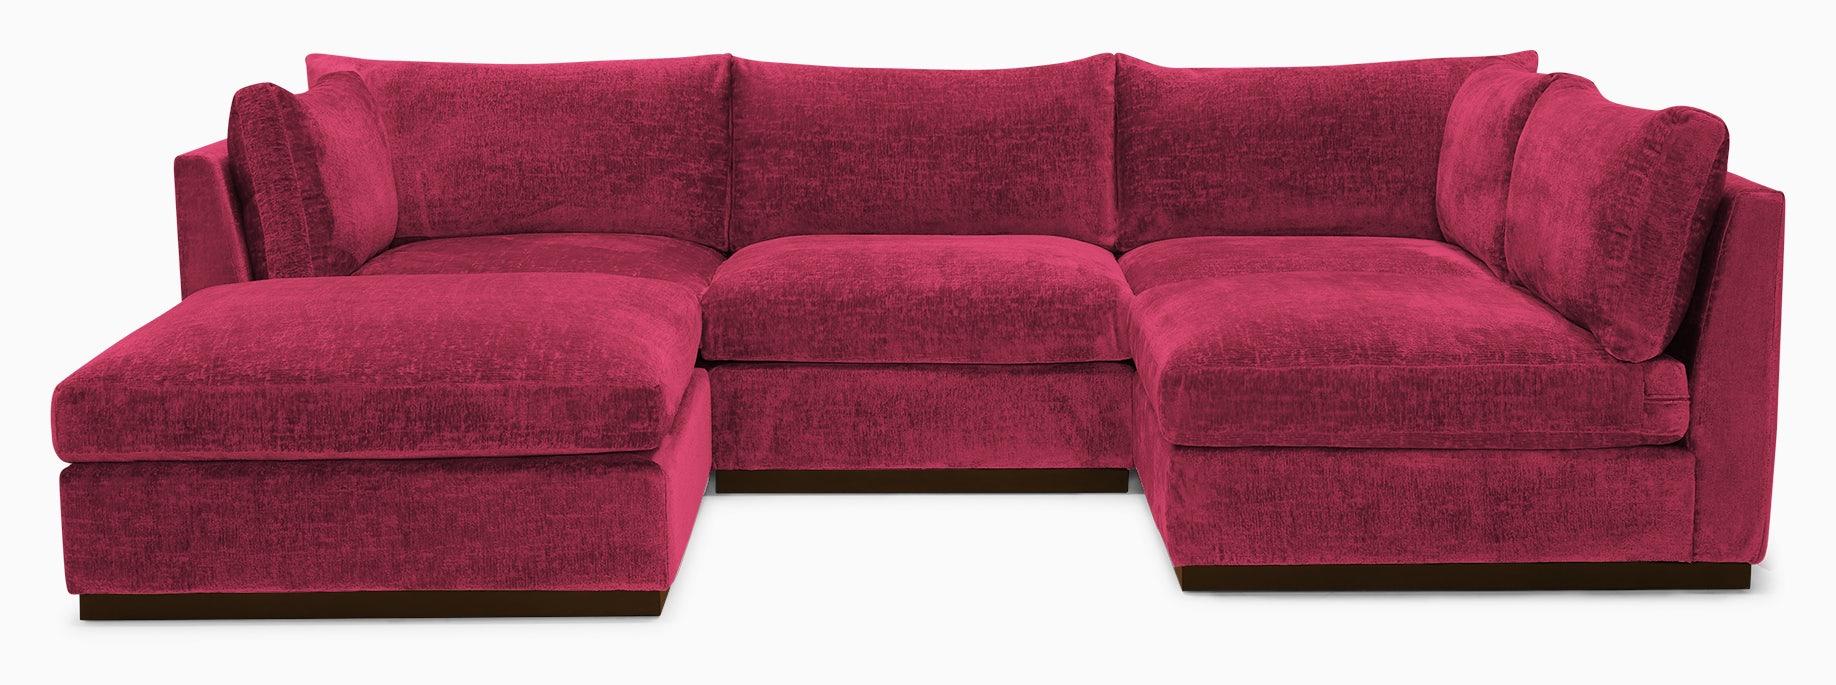 holt armless sofa sectional %285 piece%29 key largo bubblegum